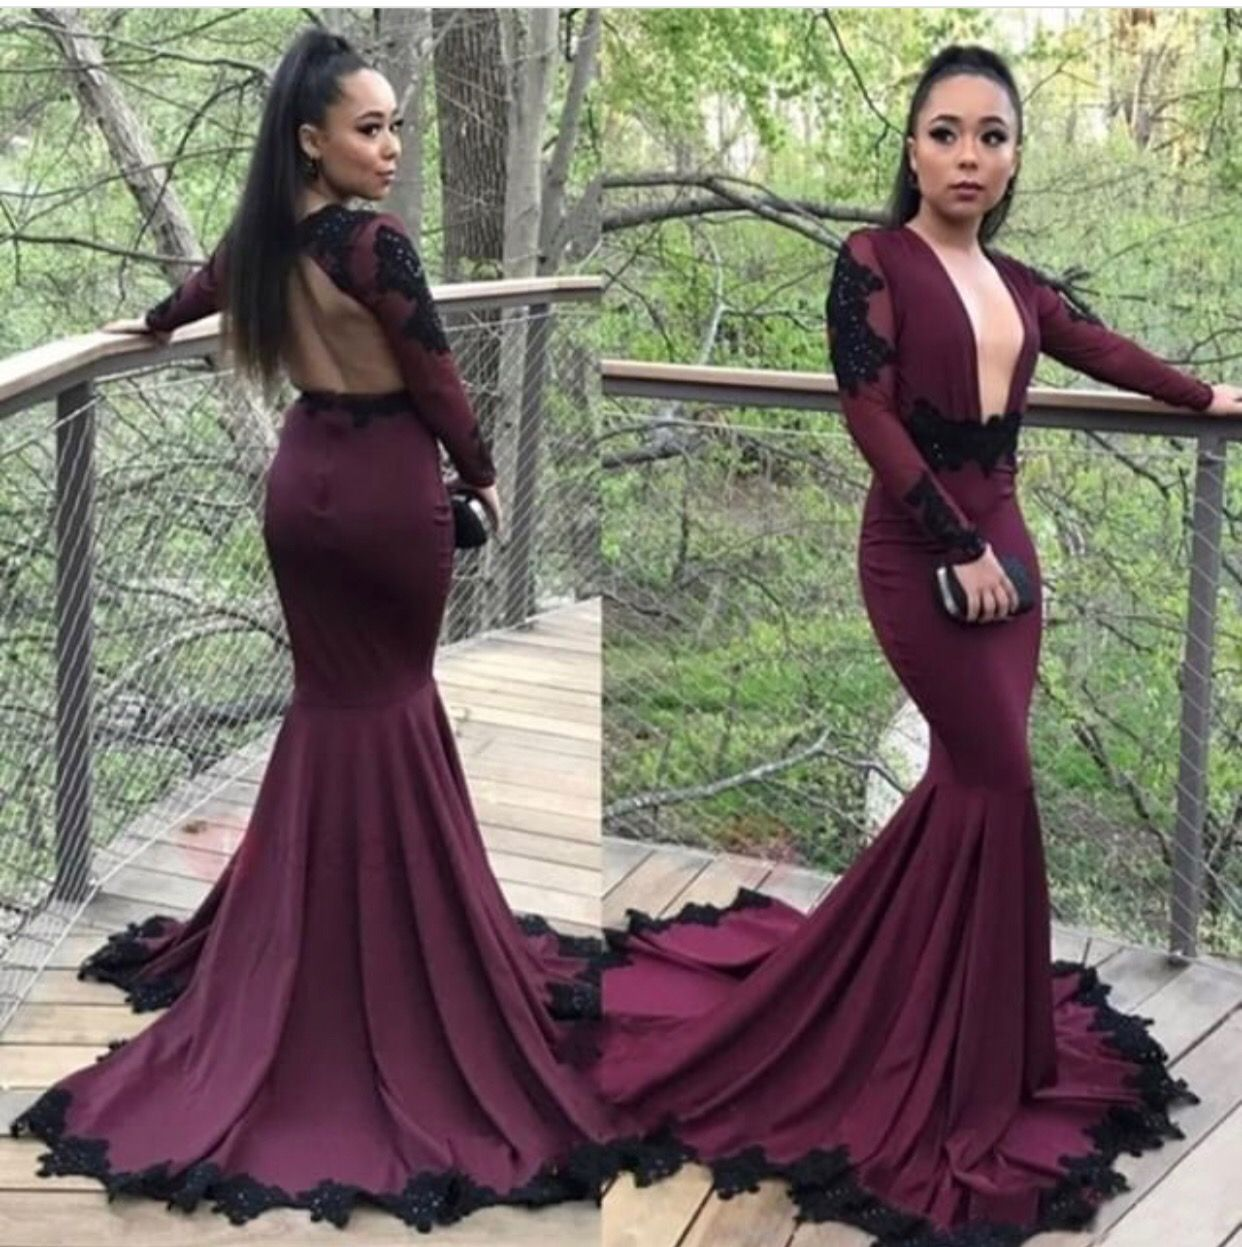 Long sleeves designer prom dress date night glam night